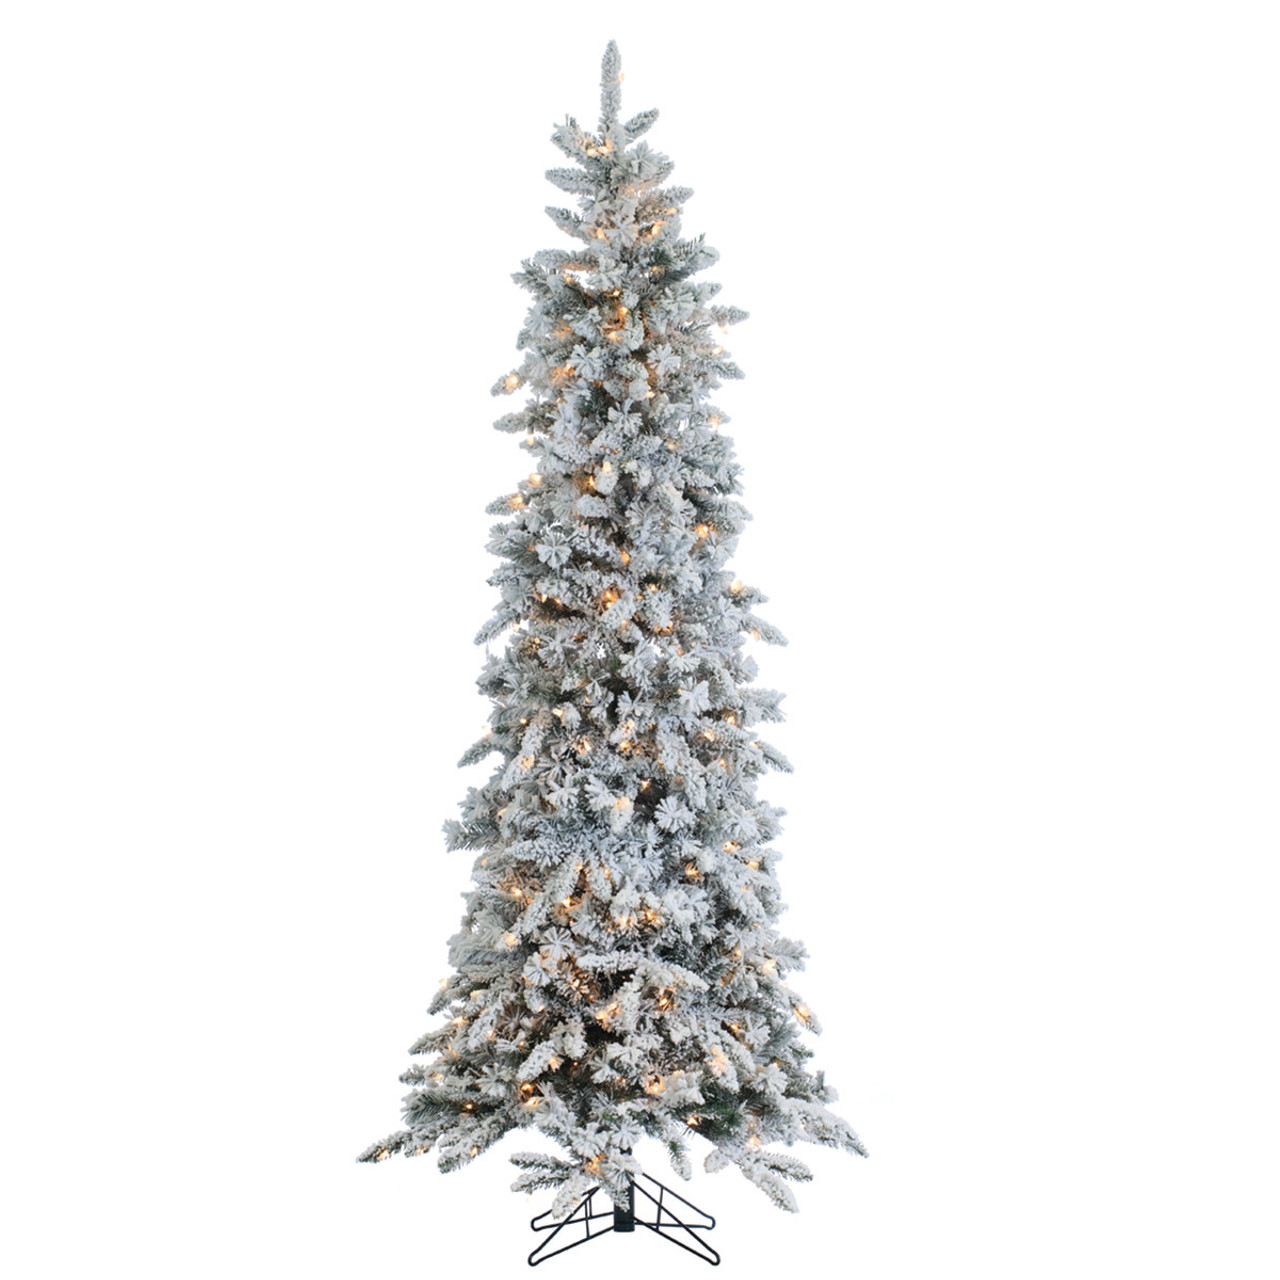 new product 80fa4 31b66 7.5' Prelit Narrow Flocked Pencil Pine Artificial Christmas Tree